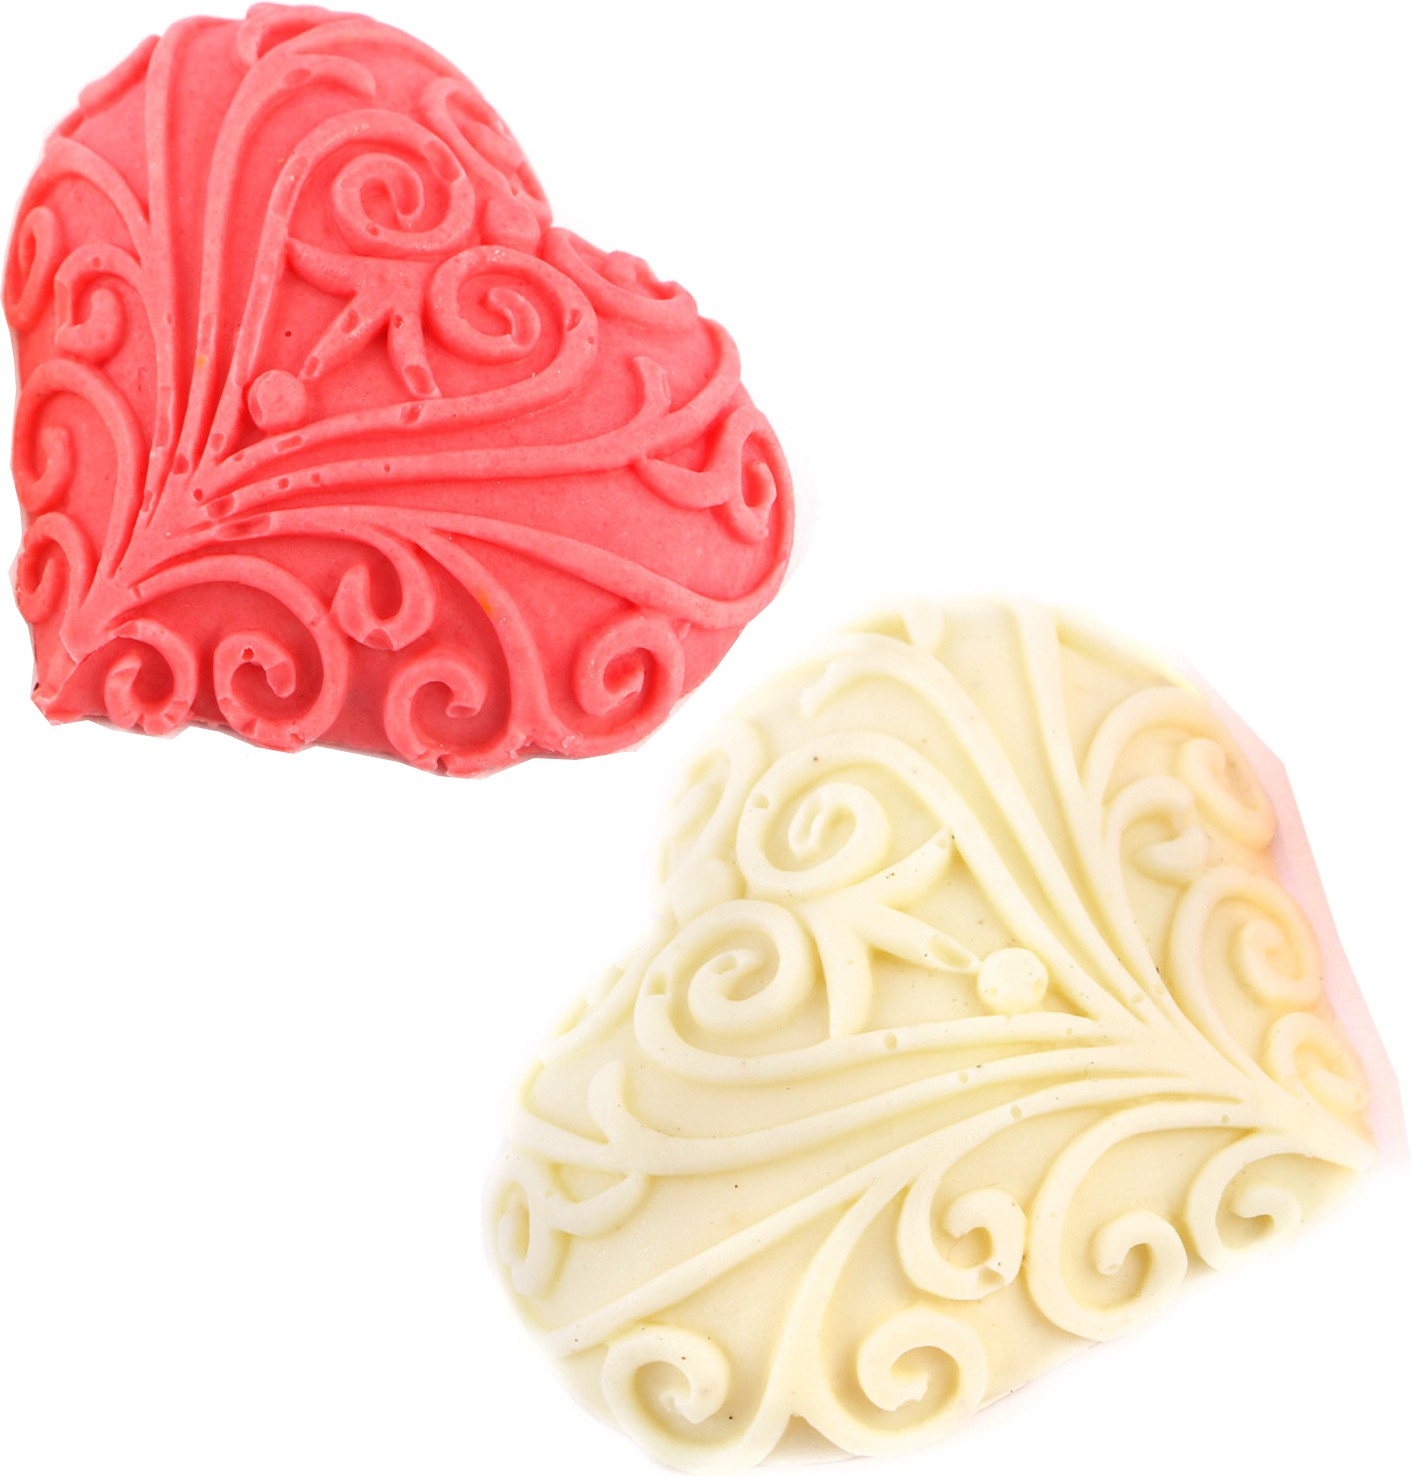 Ghasitaram Gifts Set of 2 Designer Hearts Chocolate Bars